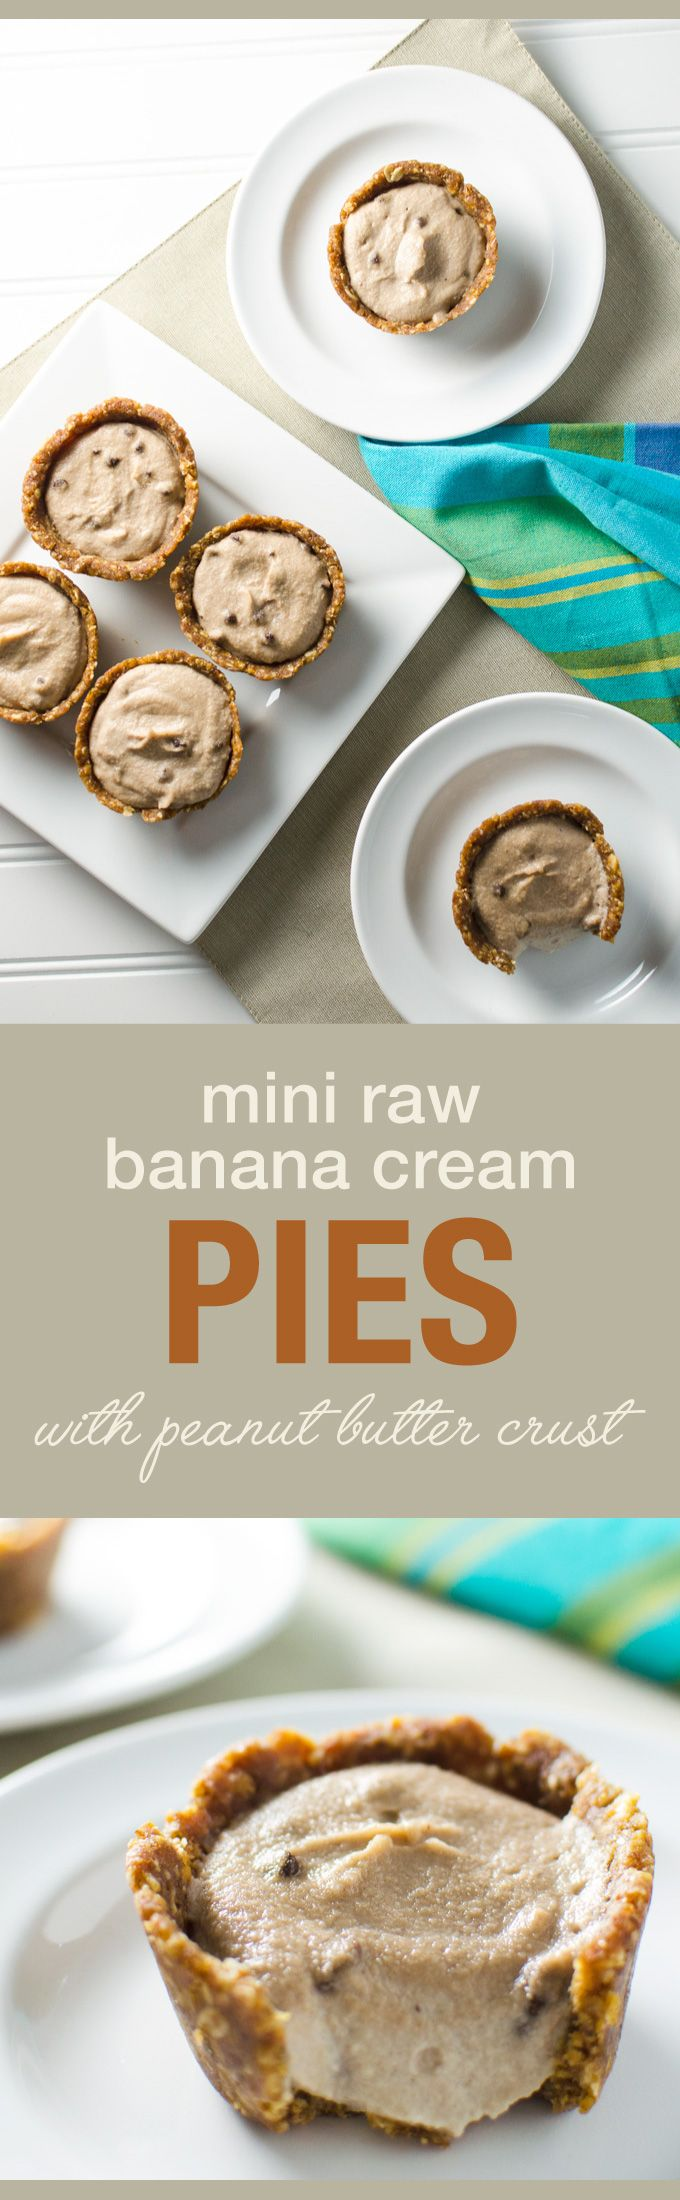 Mini Raw Banana Cream Pies with peanut butter crust - a yummy vegan and gluten…